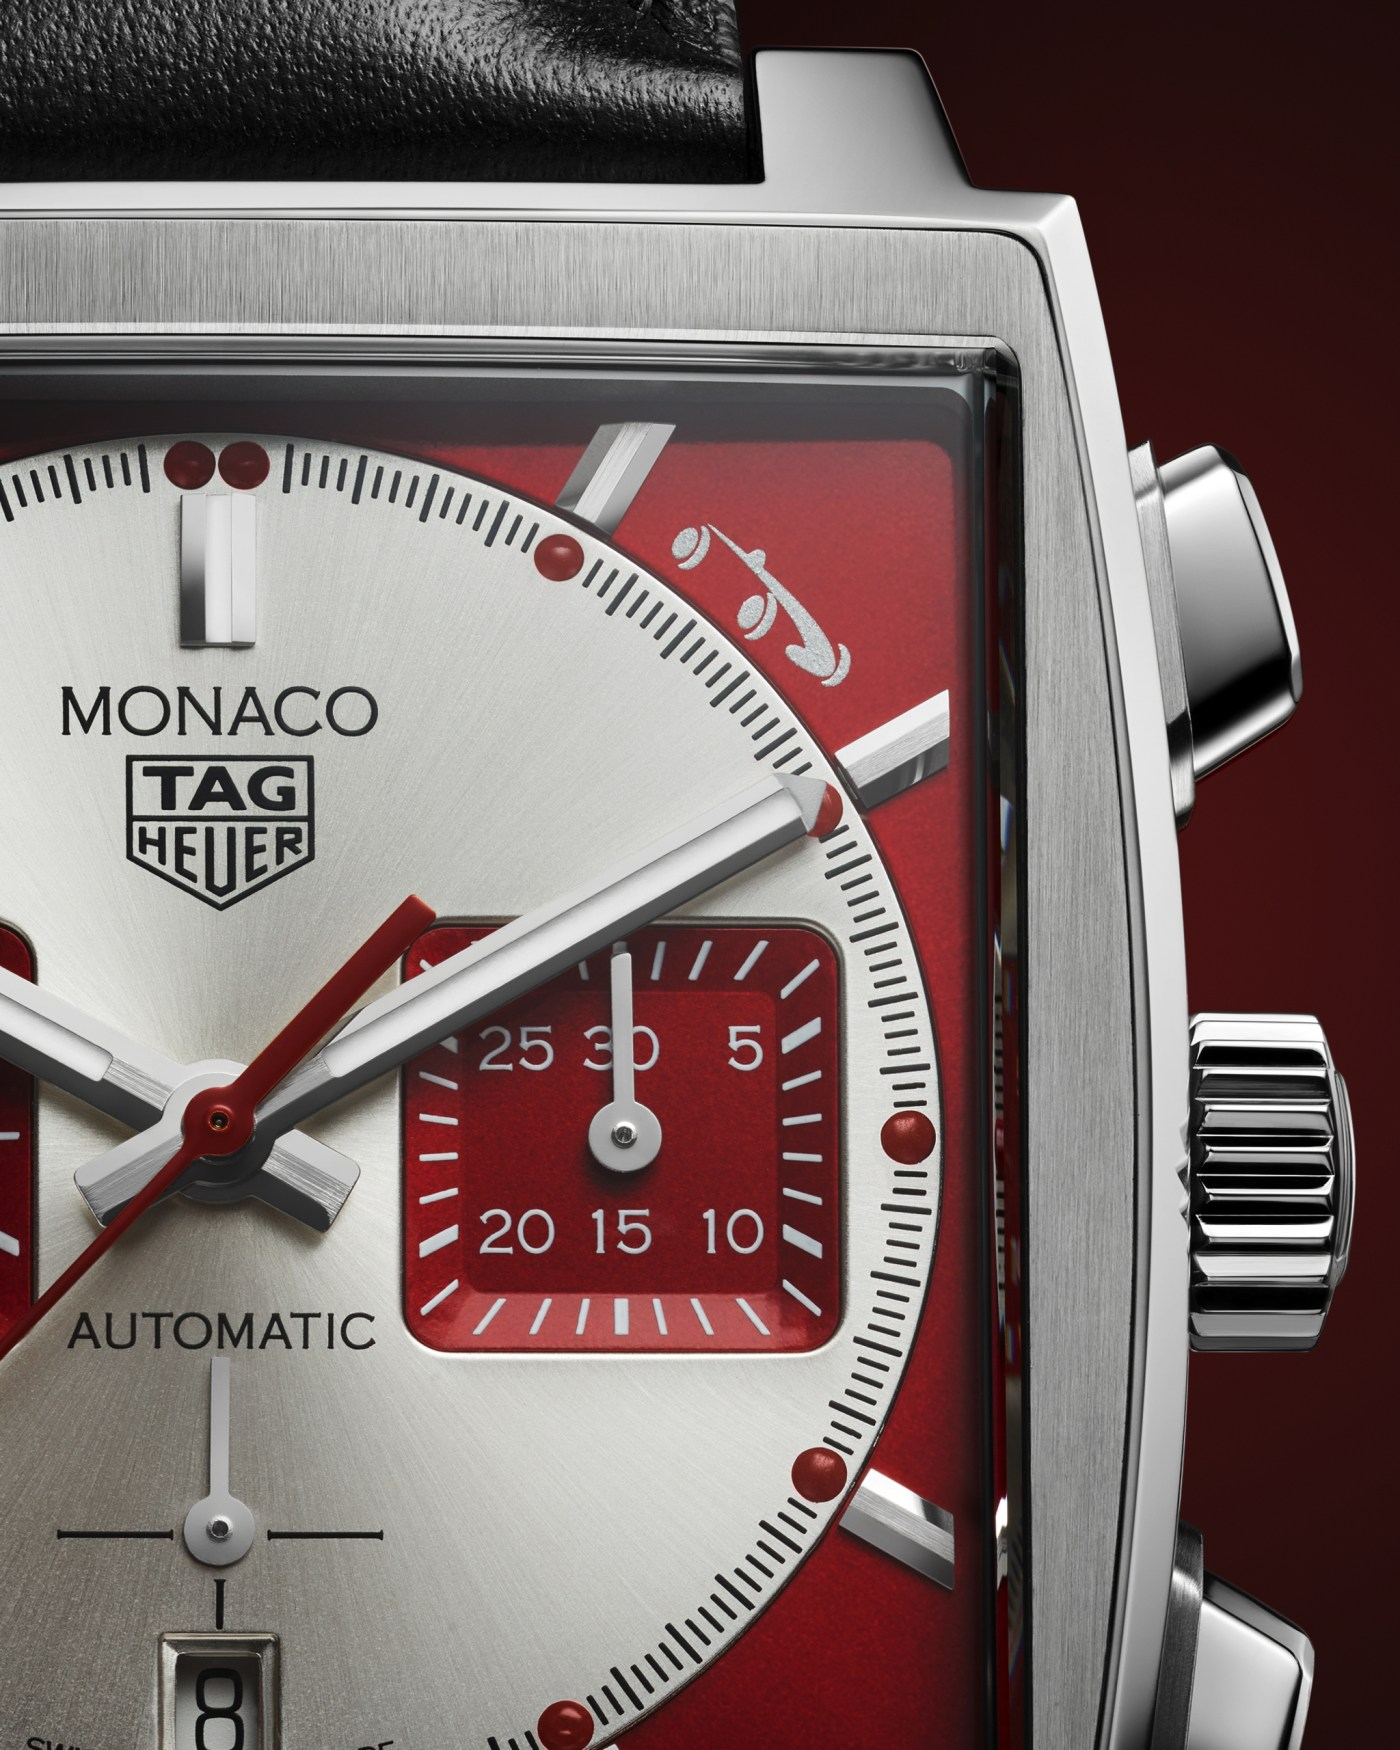 TAG Heuer Monaco Grand Prix de Monaco Historique Limited Edition dial